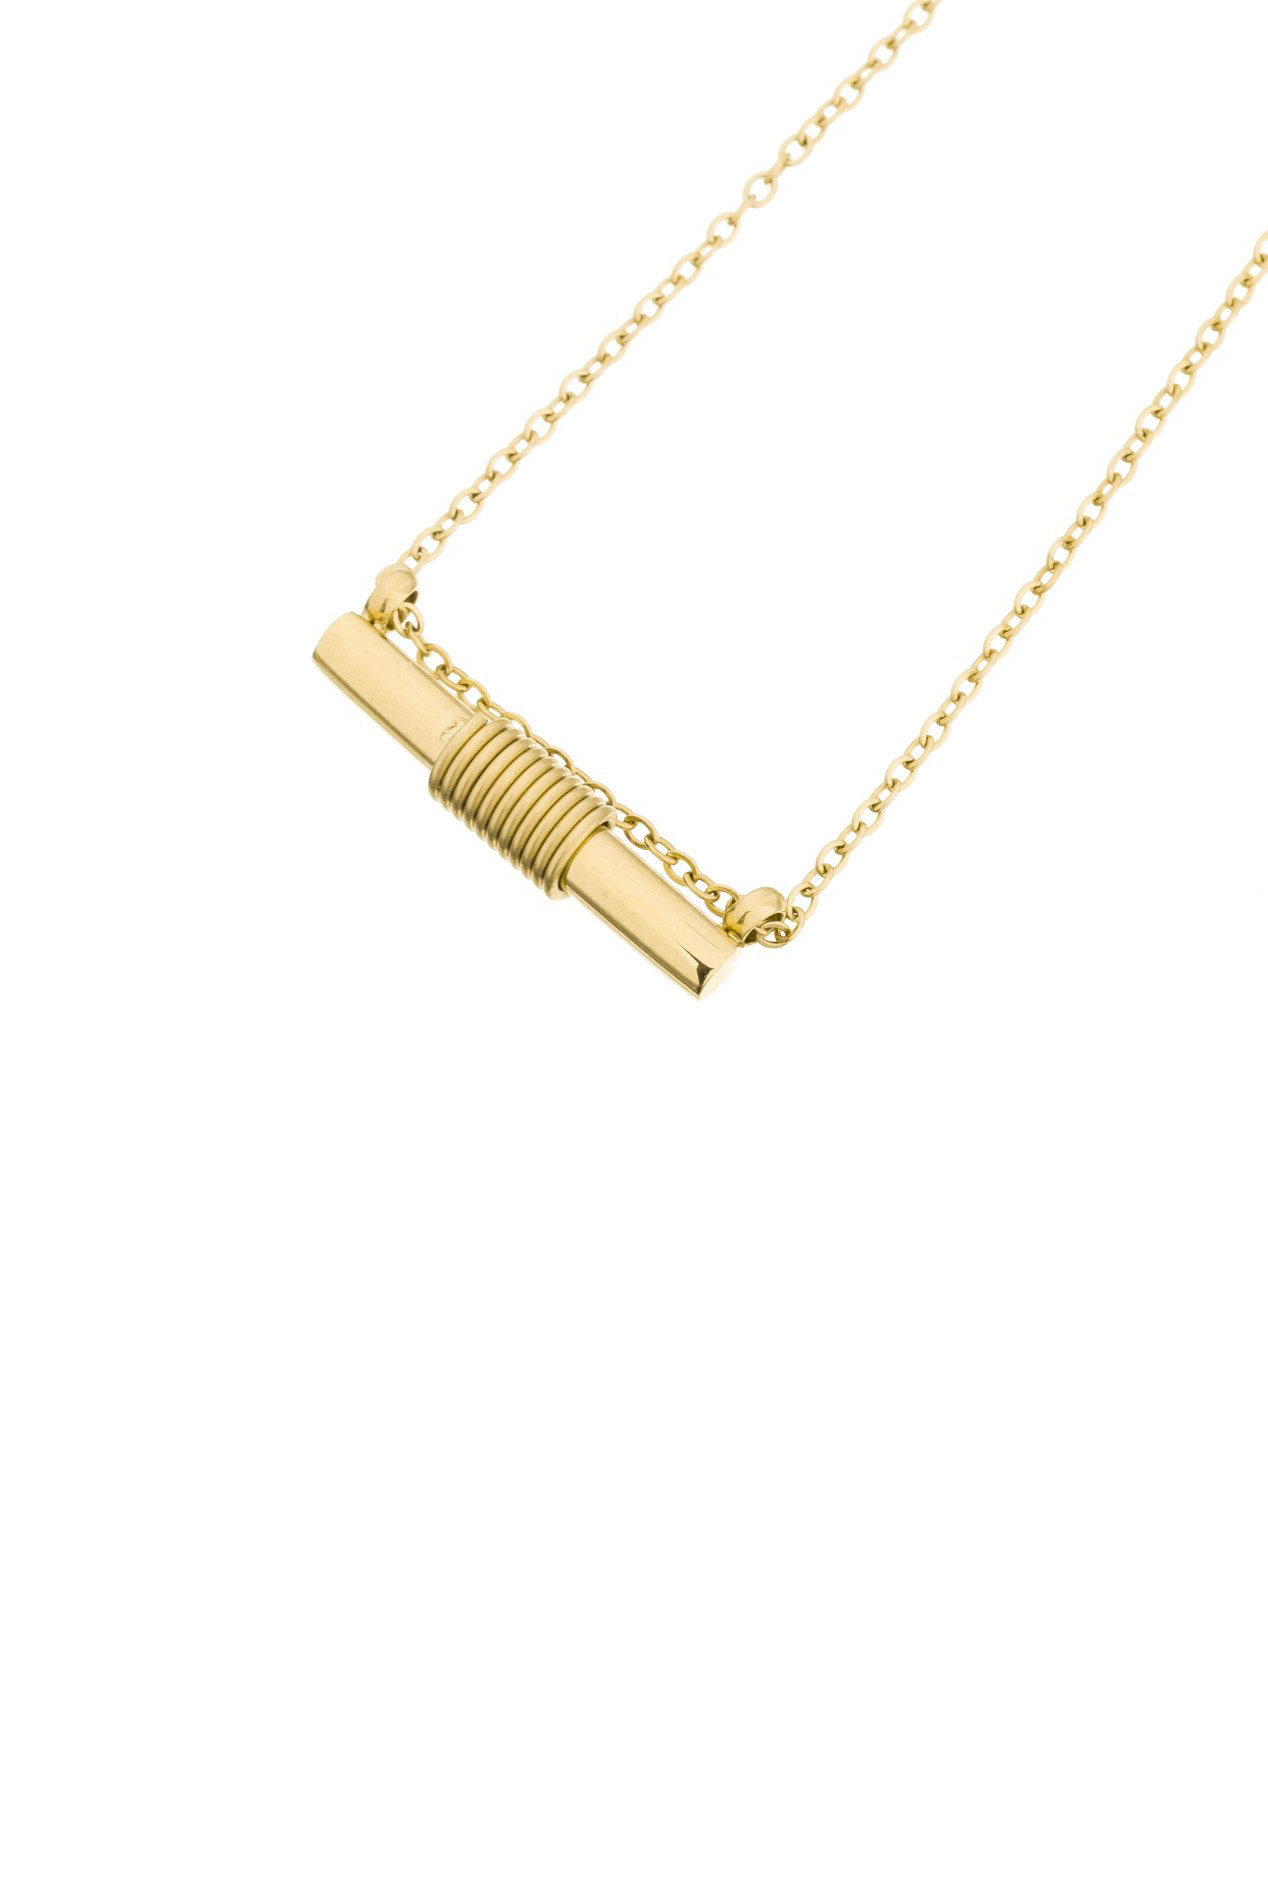 Spiral Necklace - Gold-1